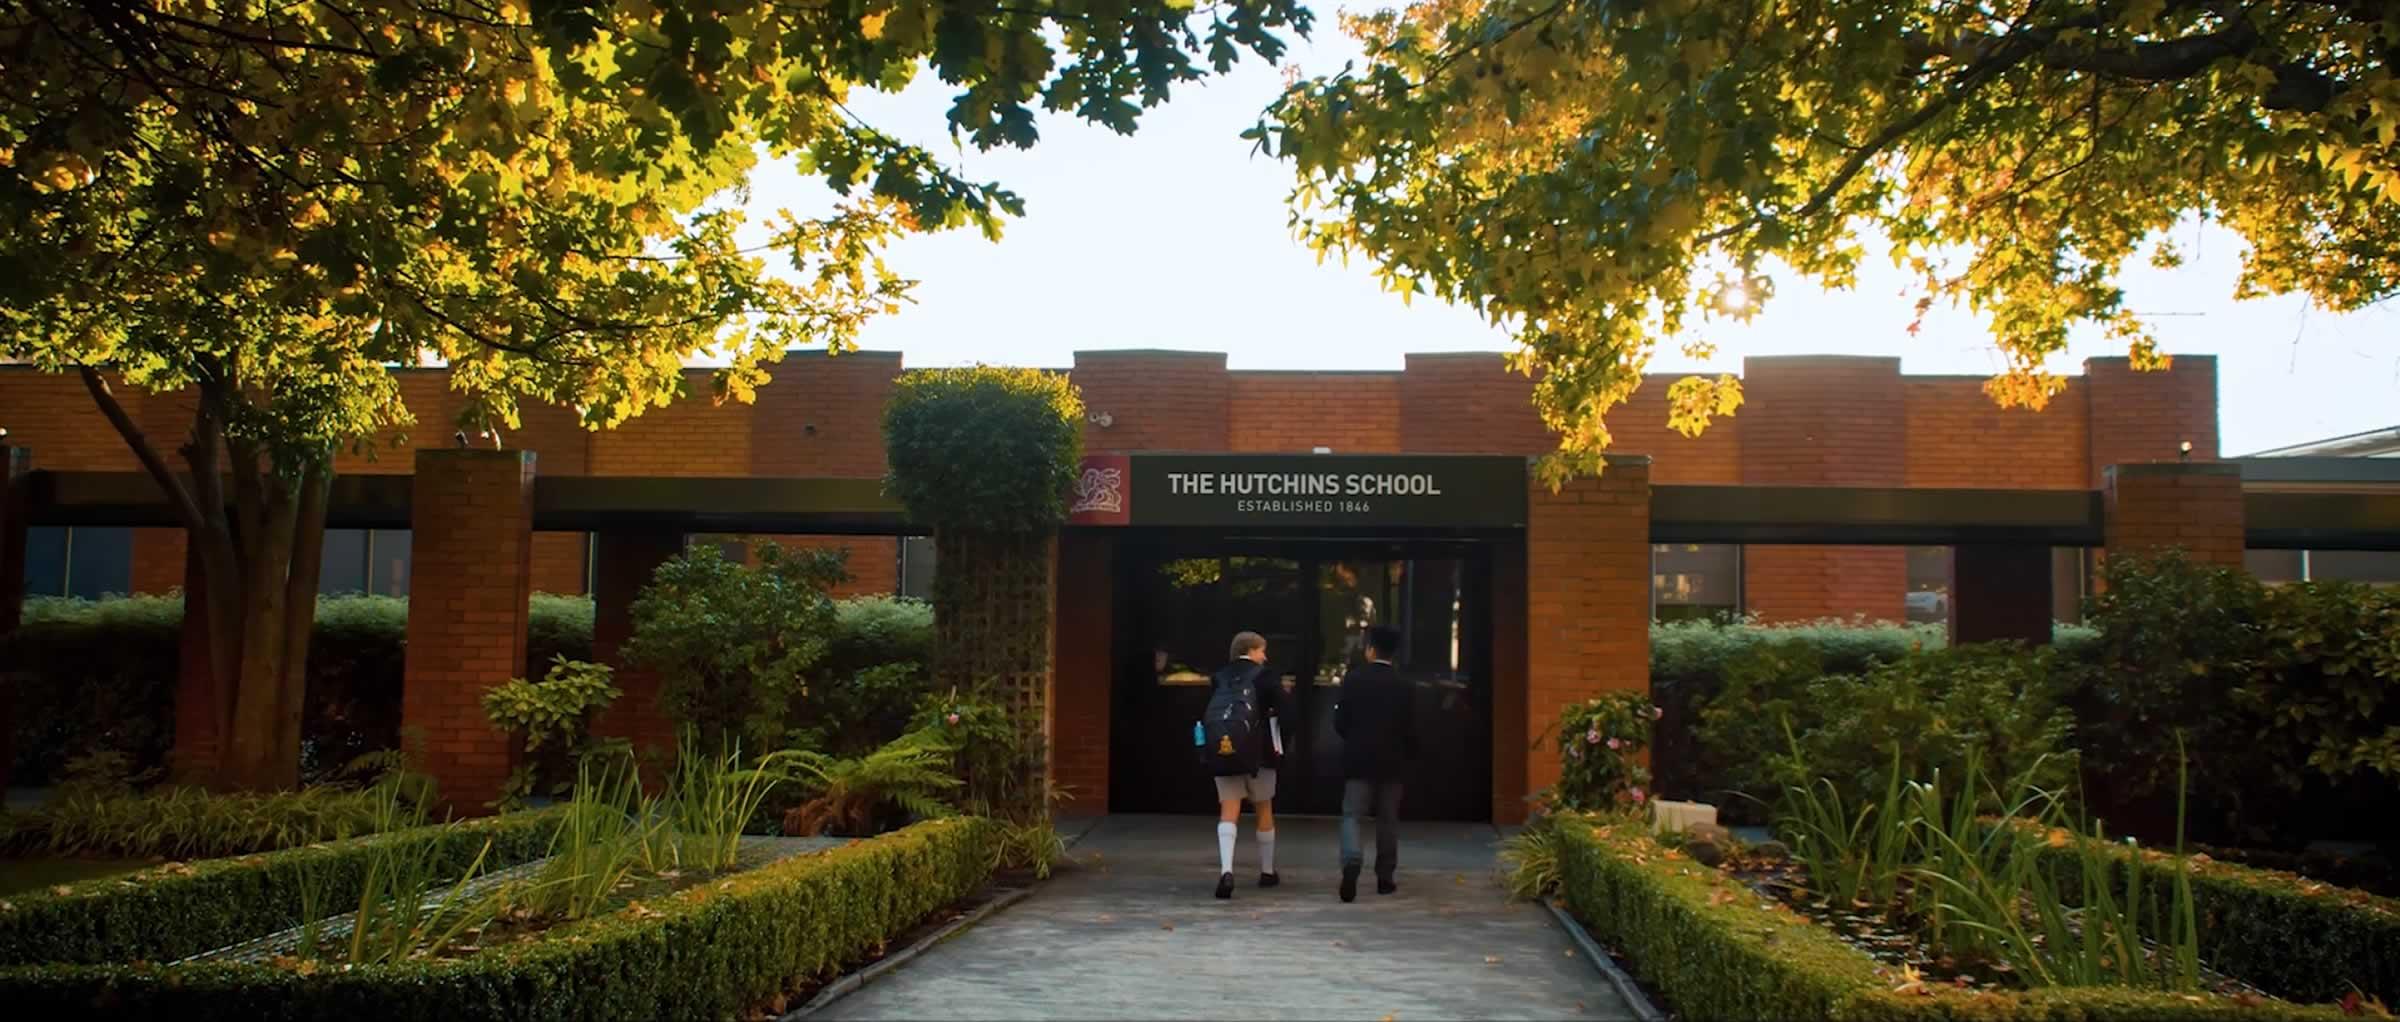 the_hutchins_school_video_2018